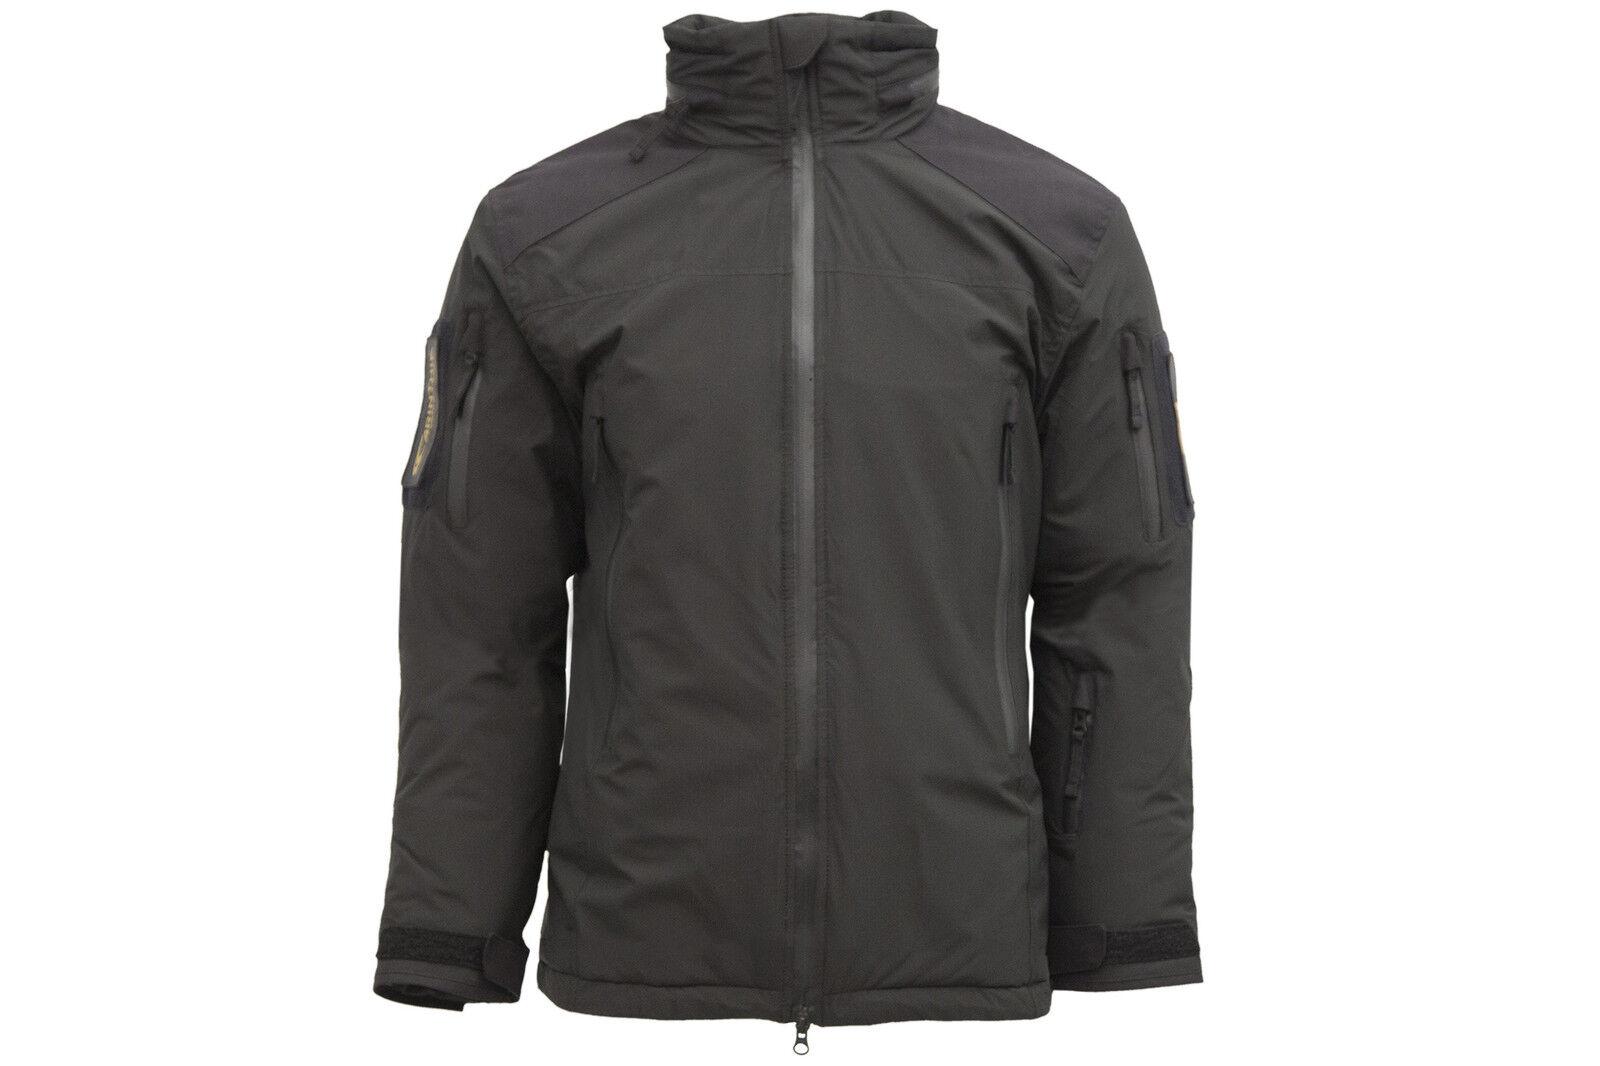 AutoINTHIA HIG 3.0 HOGE INSULABindenGARAMannenT Buitenshuis Winter Jacke schwarz XL XGroot